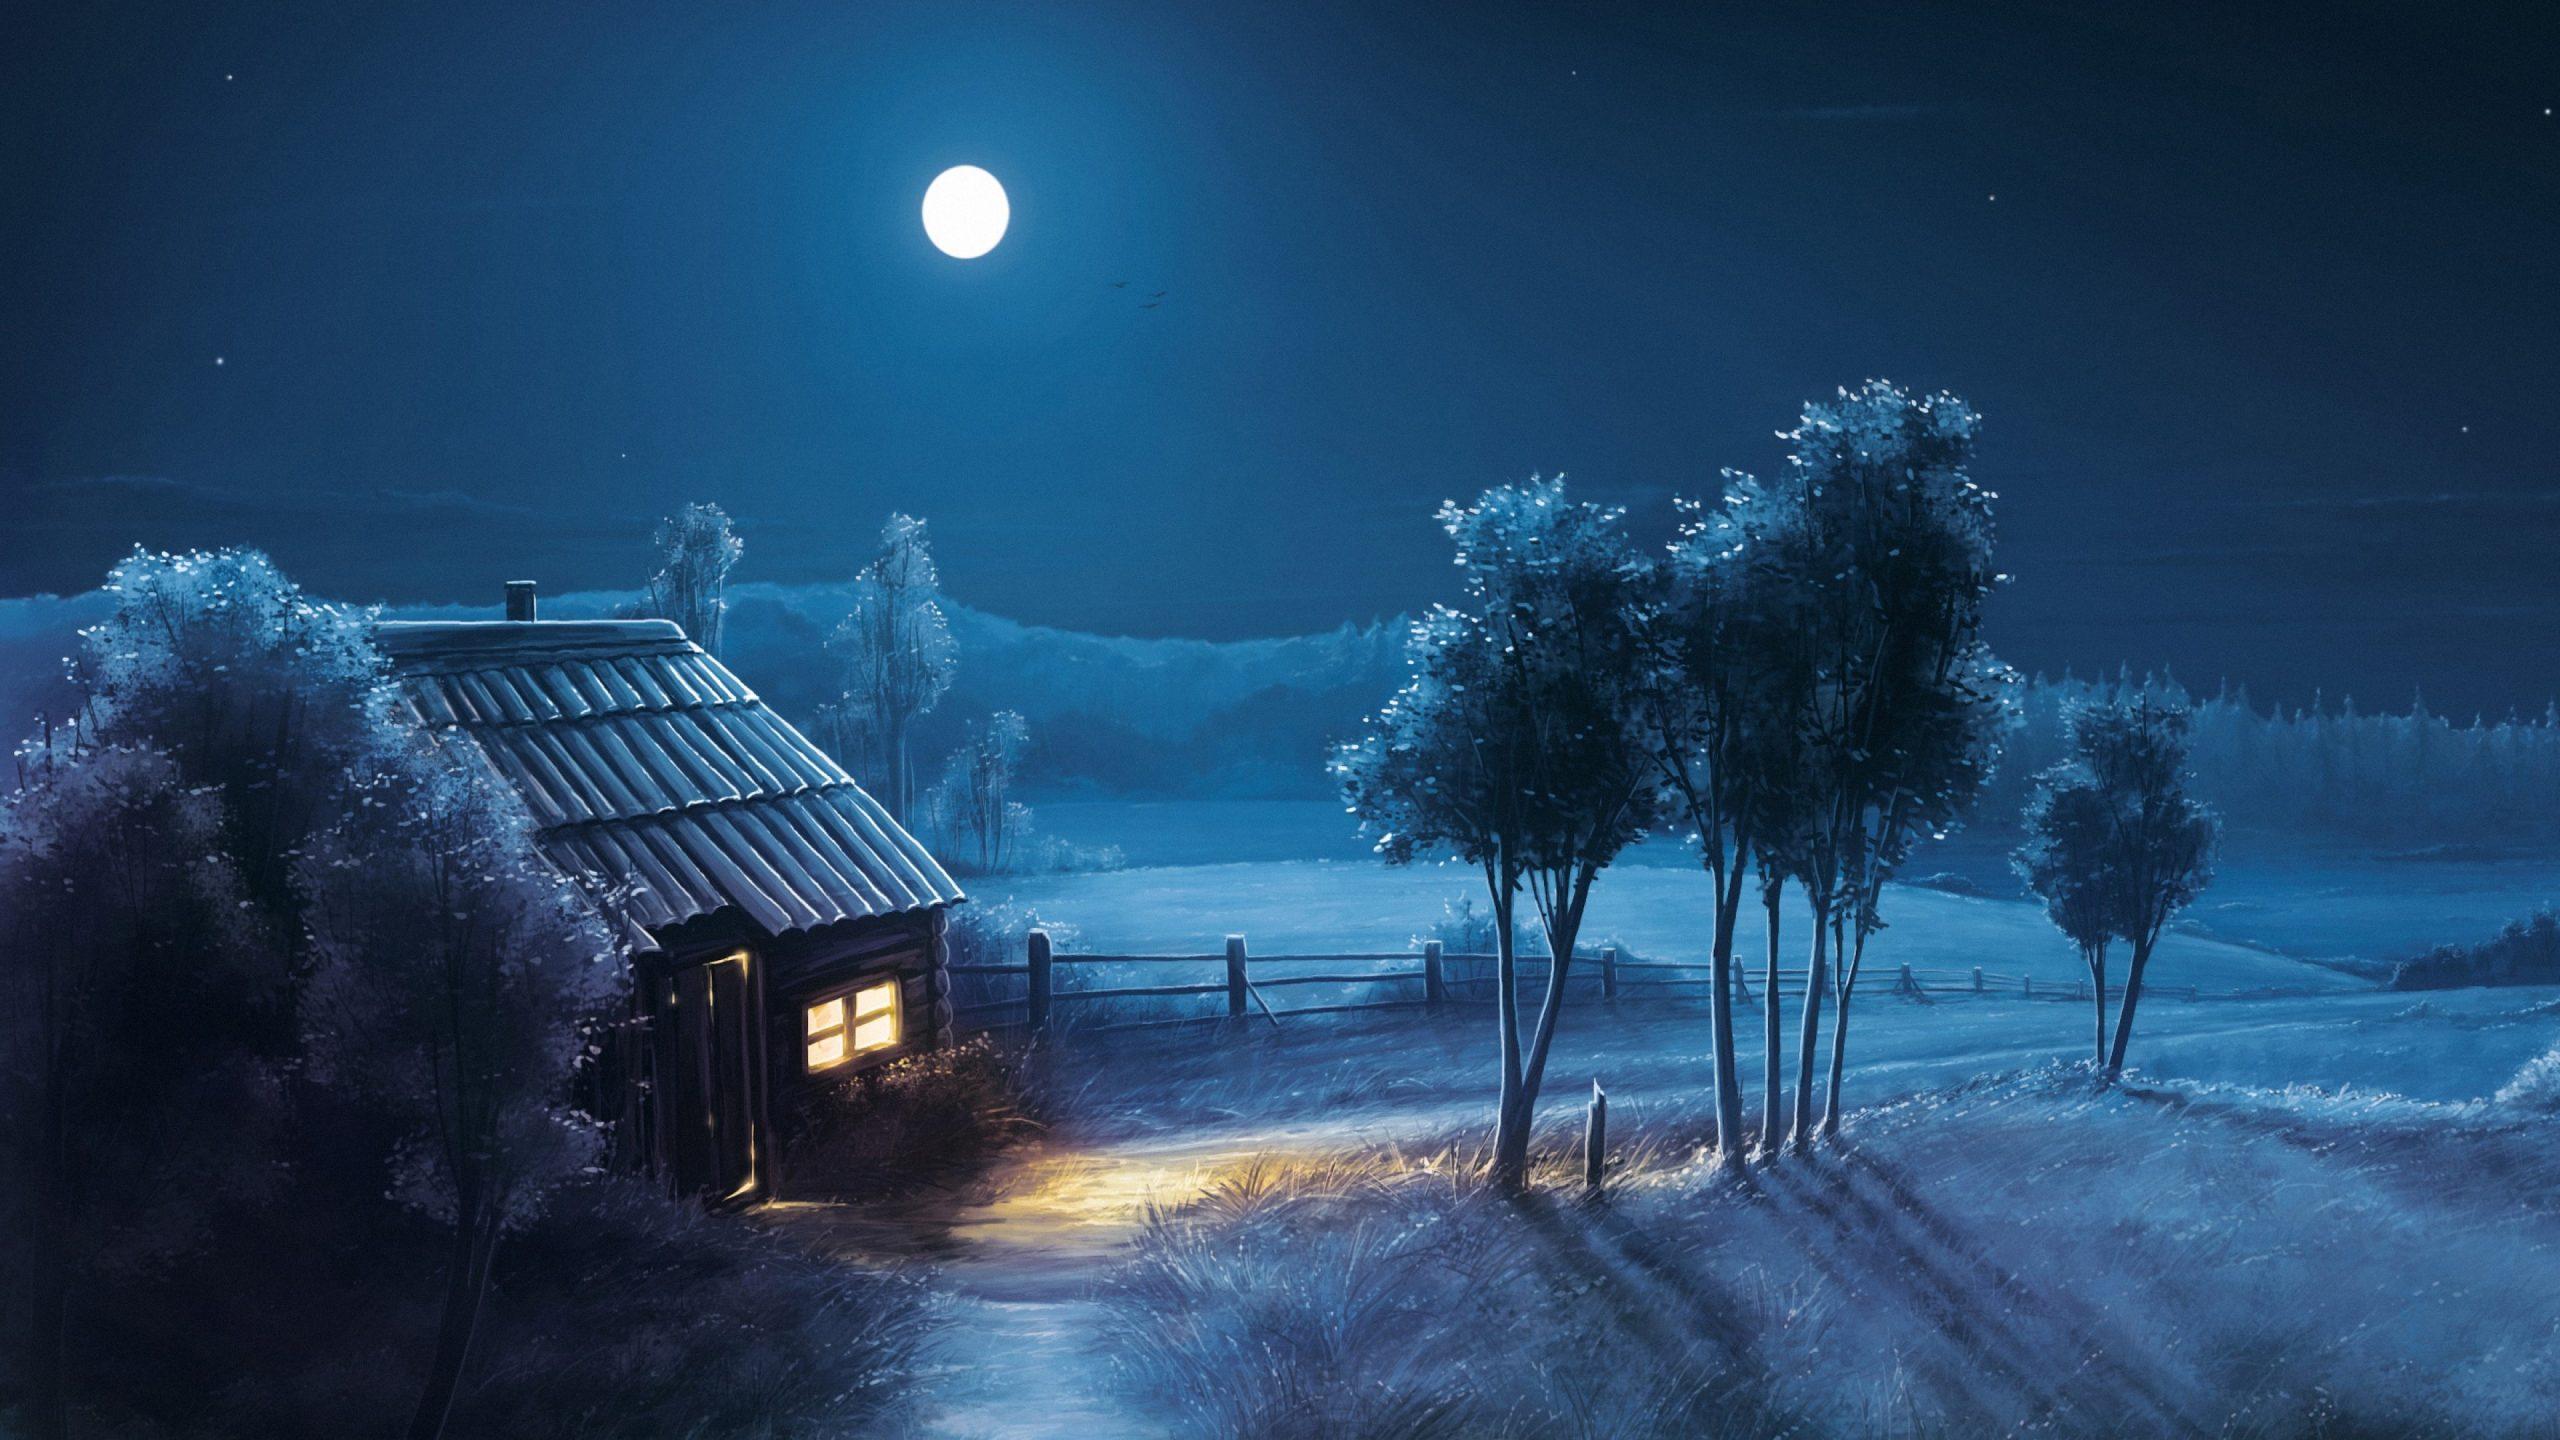 Art Moon Blue Night Trees Hause 4K Wallpaper